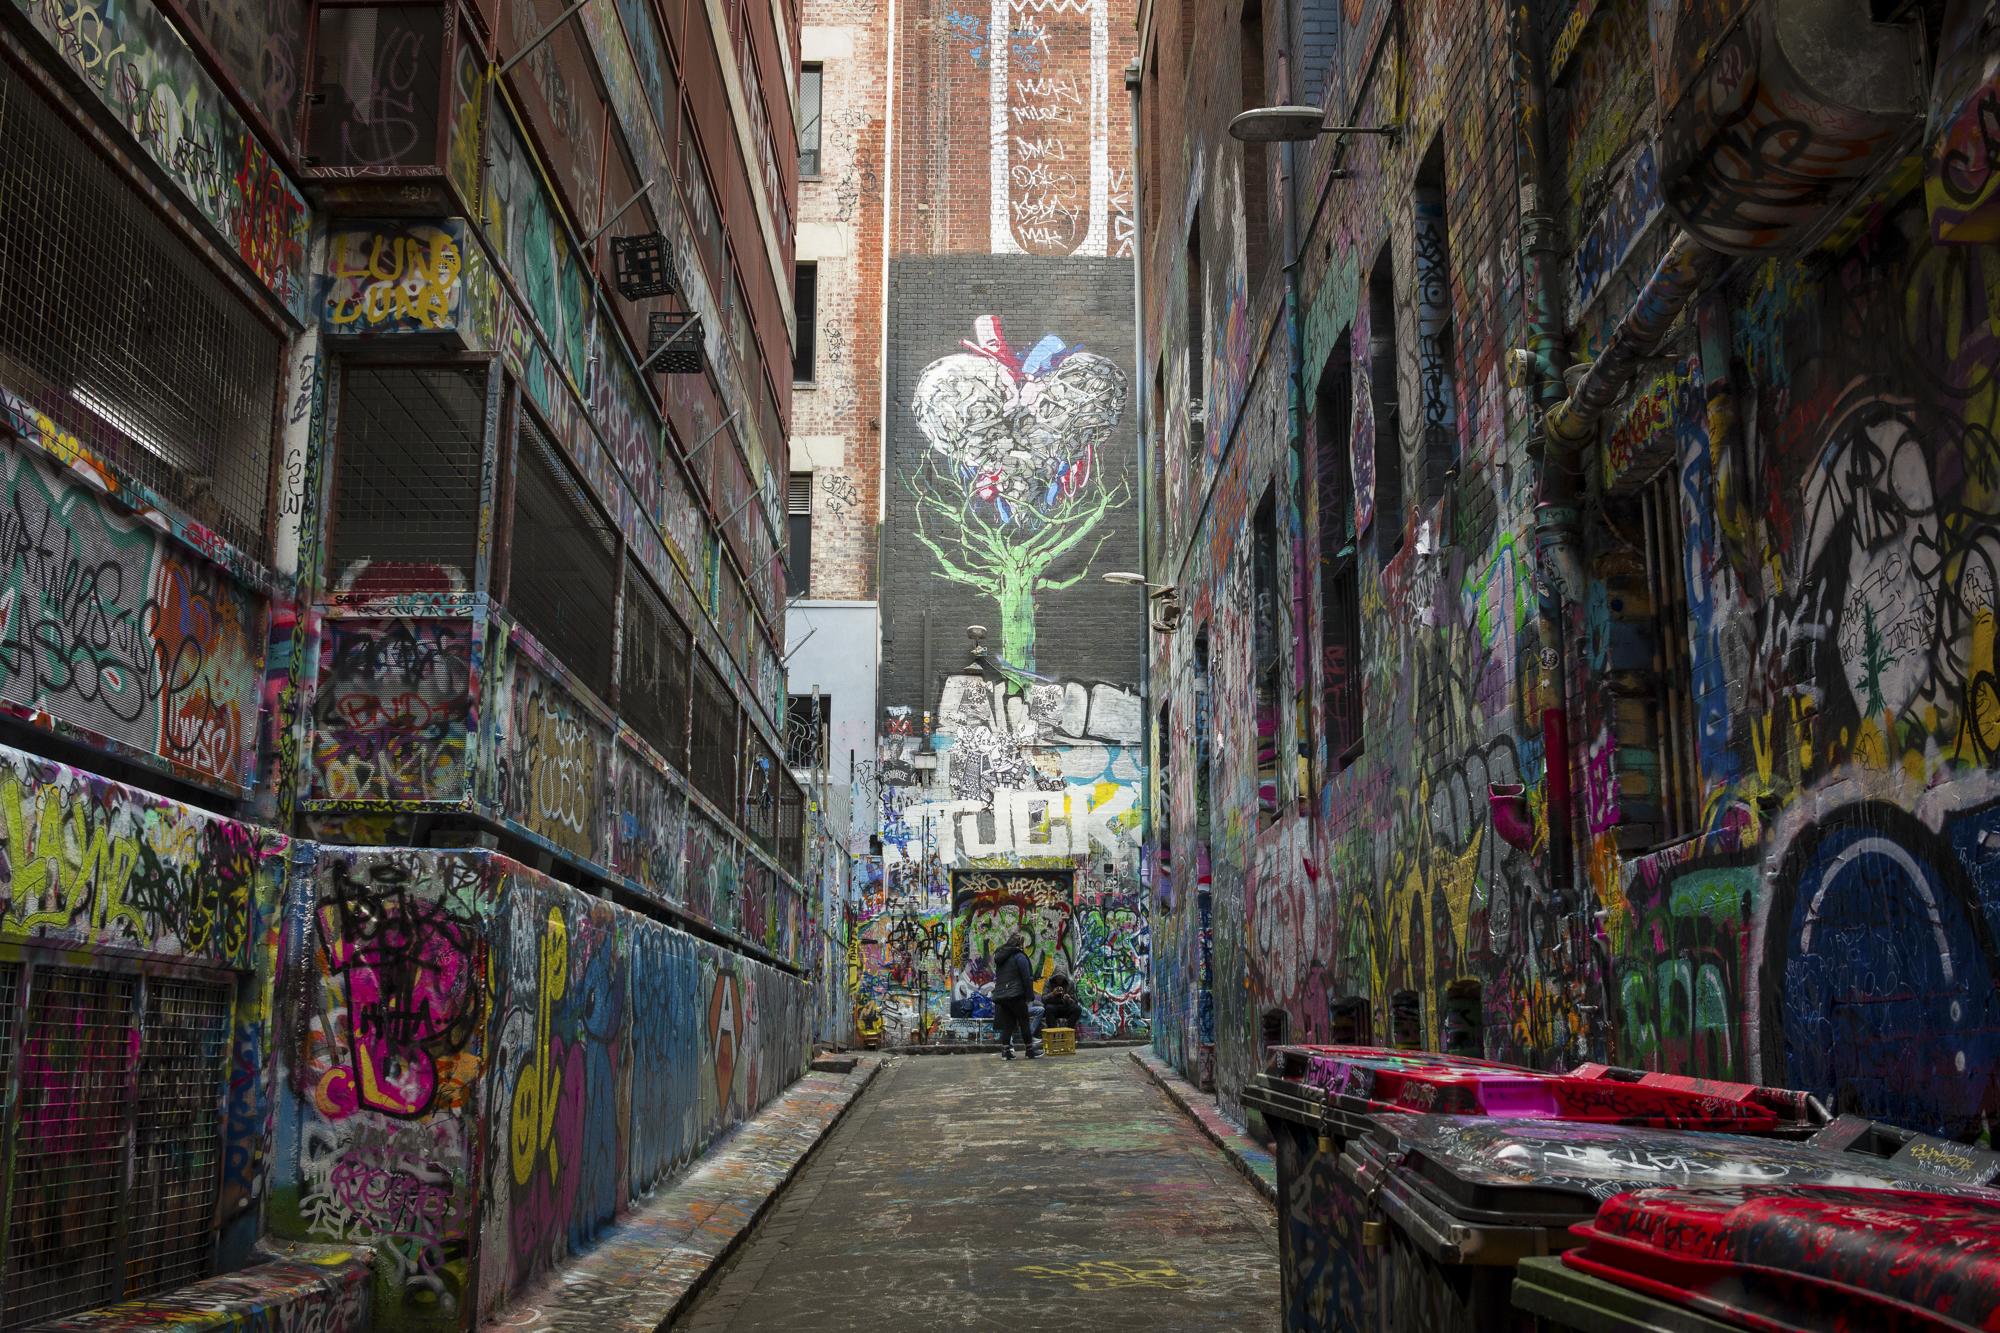 Graffiti at Rutledge Lane. Melbourne, Australia 2018 .   ©  Danny Imson. Leica CL, Leica Summicron-TL 23mm F/2 ASPH